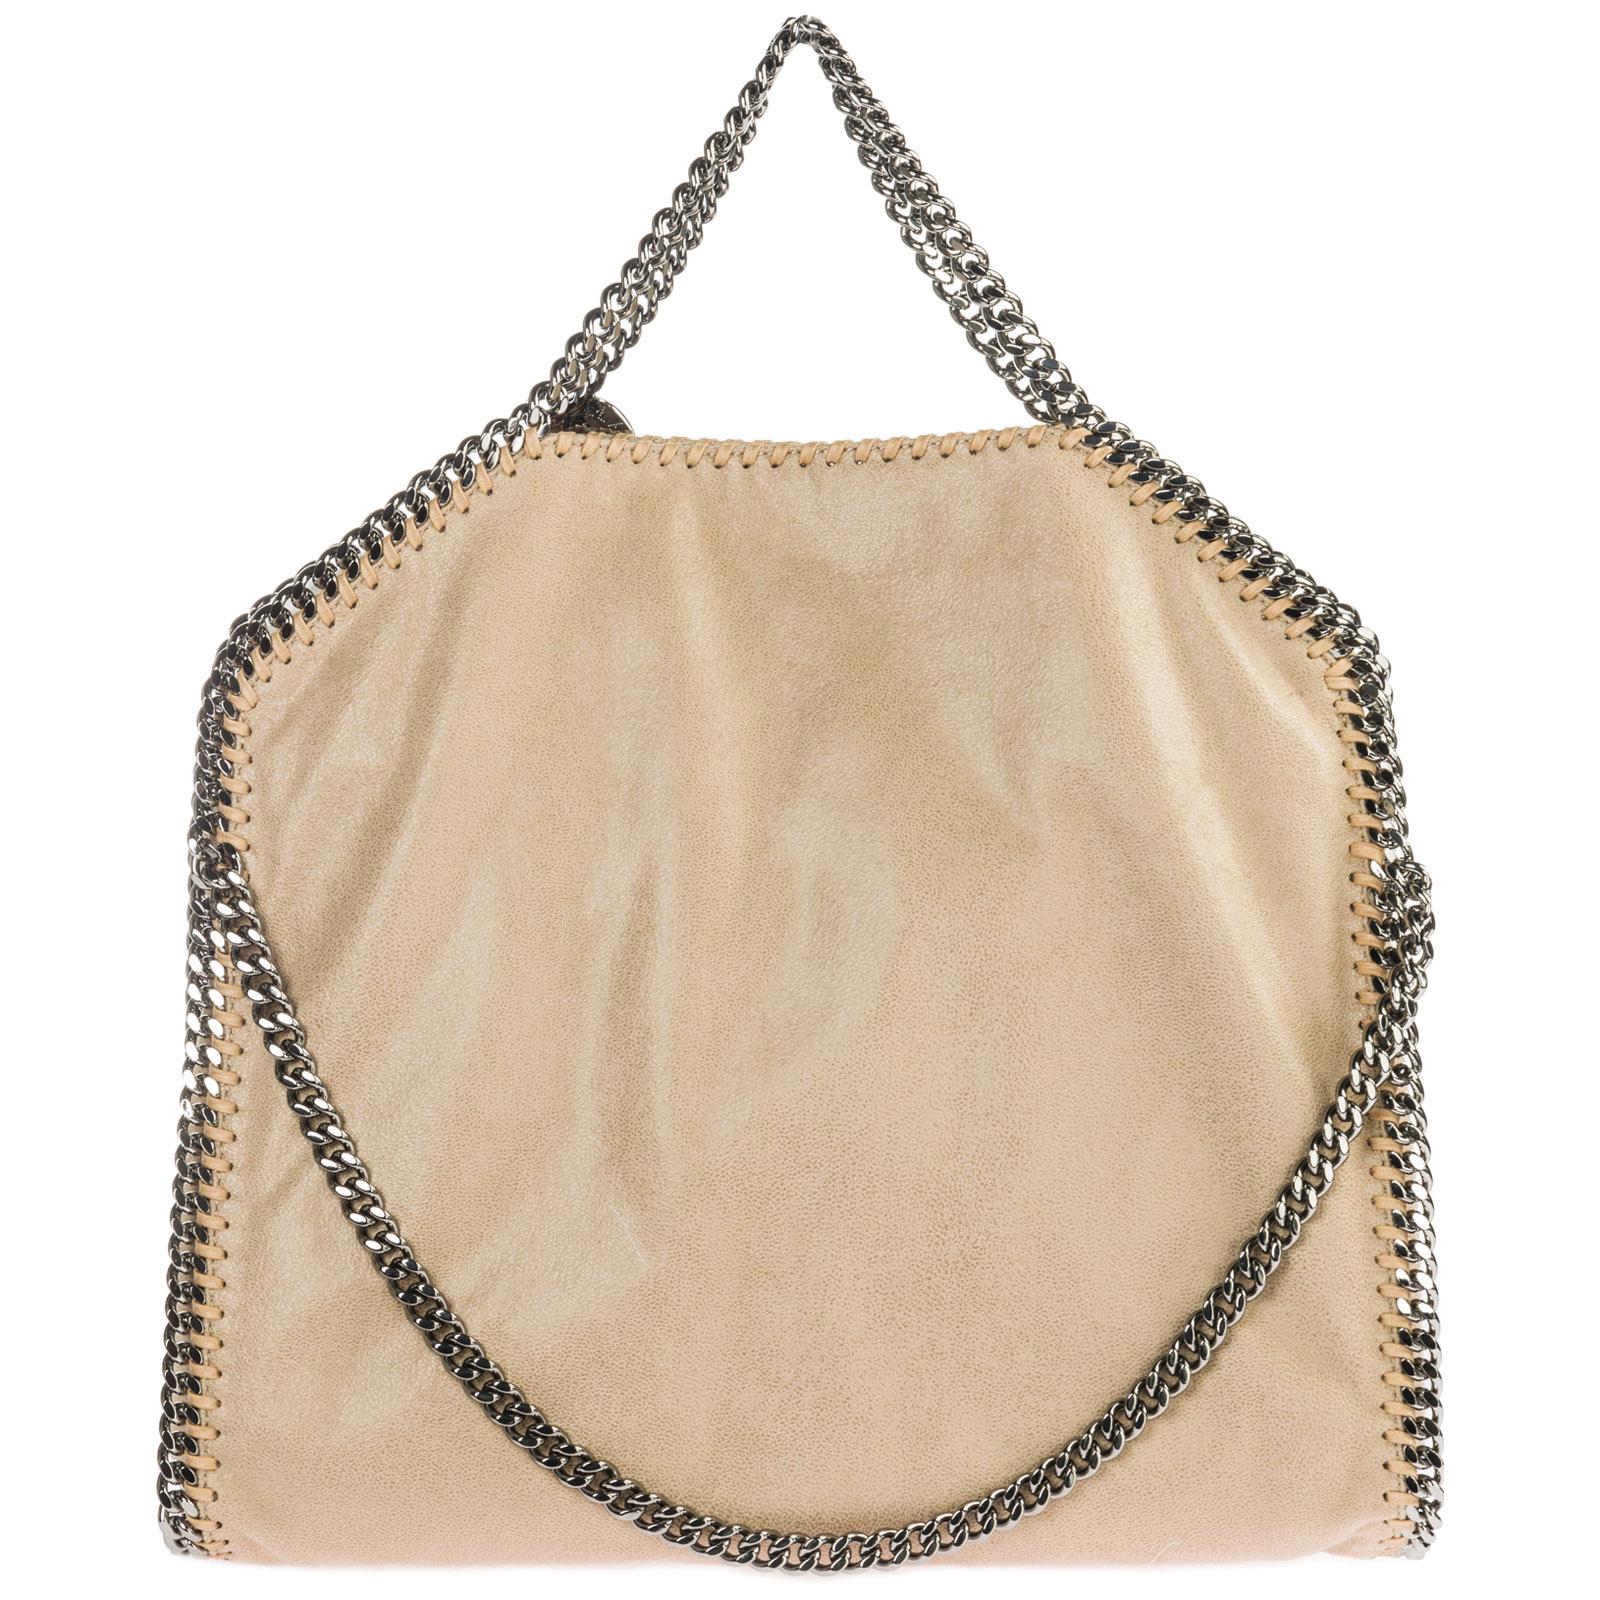 47f5fda61d7a Women s handbag shopping bag purse tote 3chain falabella fold over shaggy  deer ...